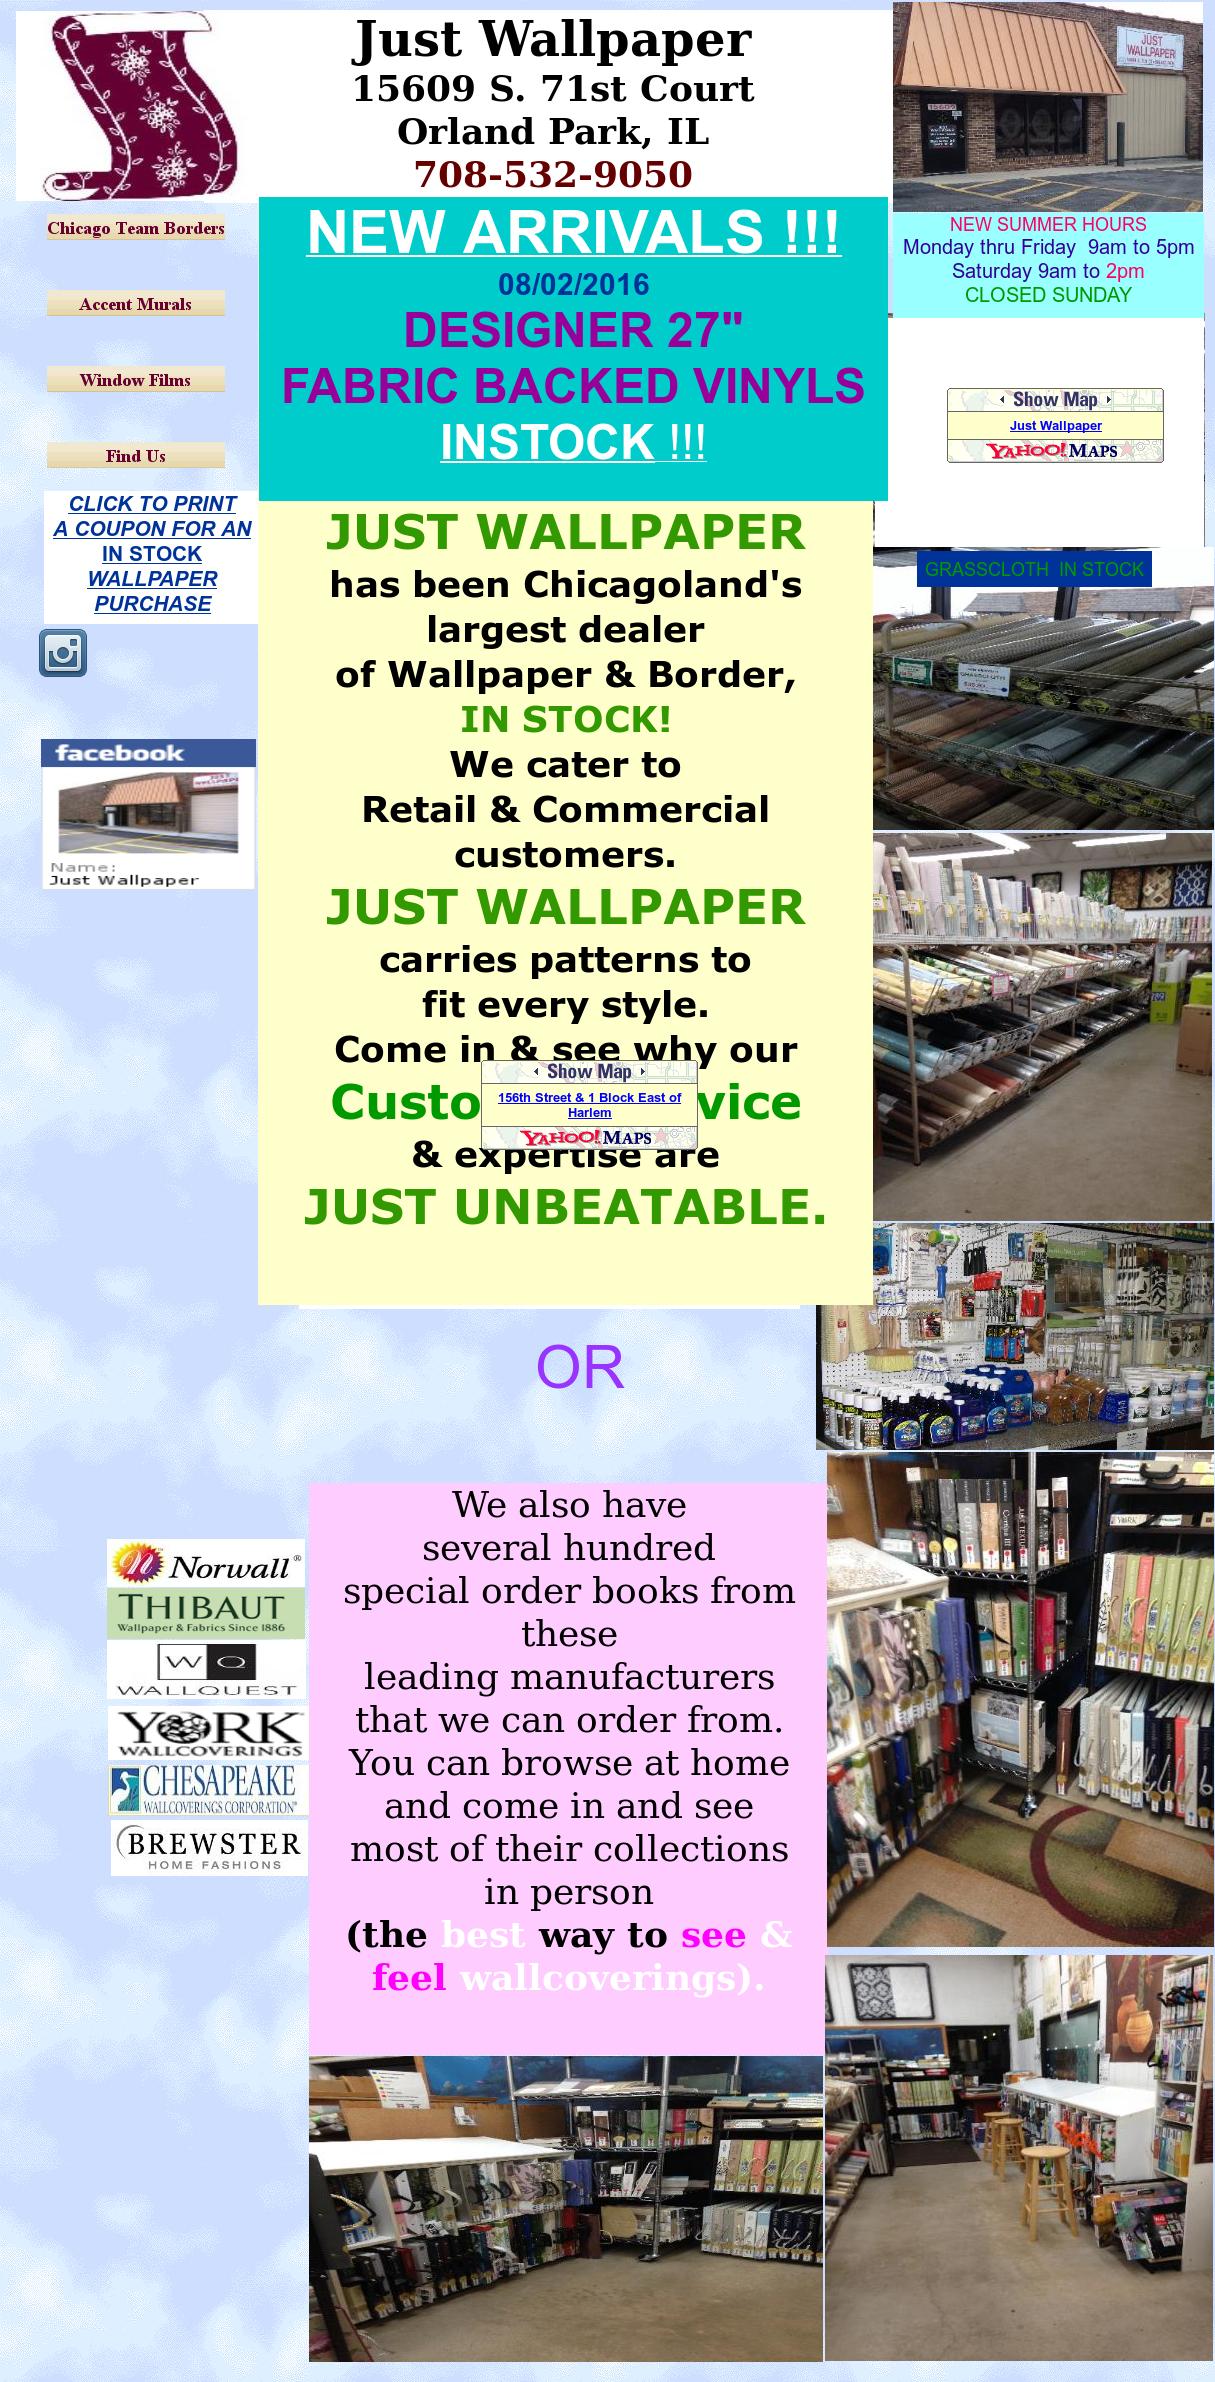 Just Wallpaper Competitors, Revenue and